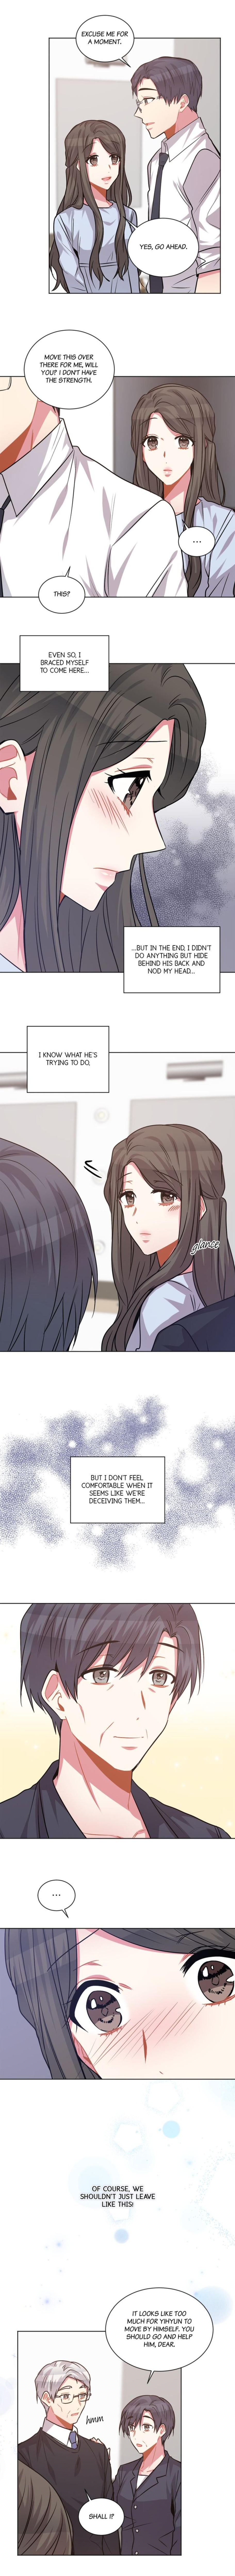 I Found Somebody To Love Chapter 69 page 7 - Mangakakalots.com